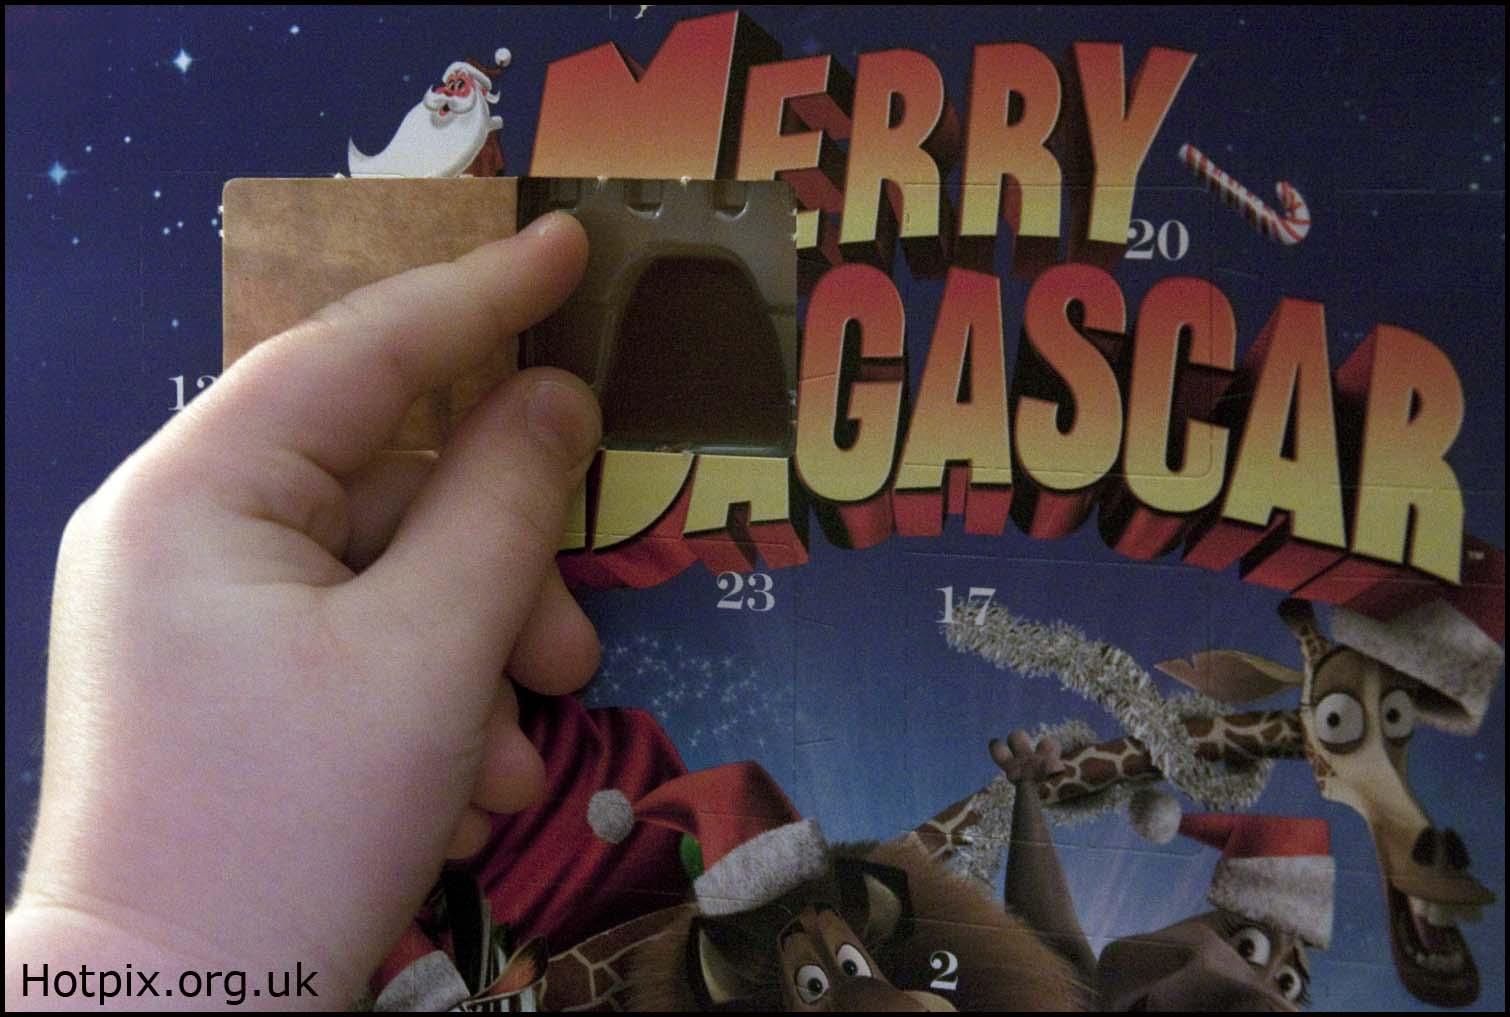 advent,calendar,calander,merry,madagascar,door,one,day,december,xmas,christmas,window,chocolate,sweets,2009,365days,hotpix.org.uk,www.hotpix.org.uk,hotpics,hotpic,hotpick,hotpicks,hotpix!